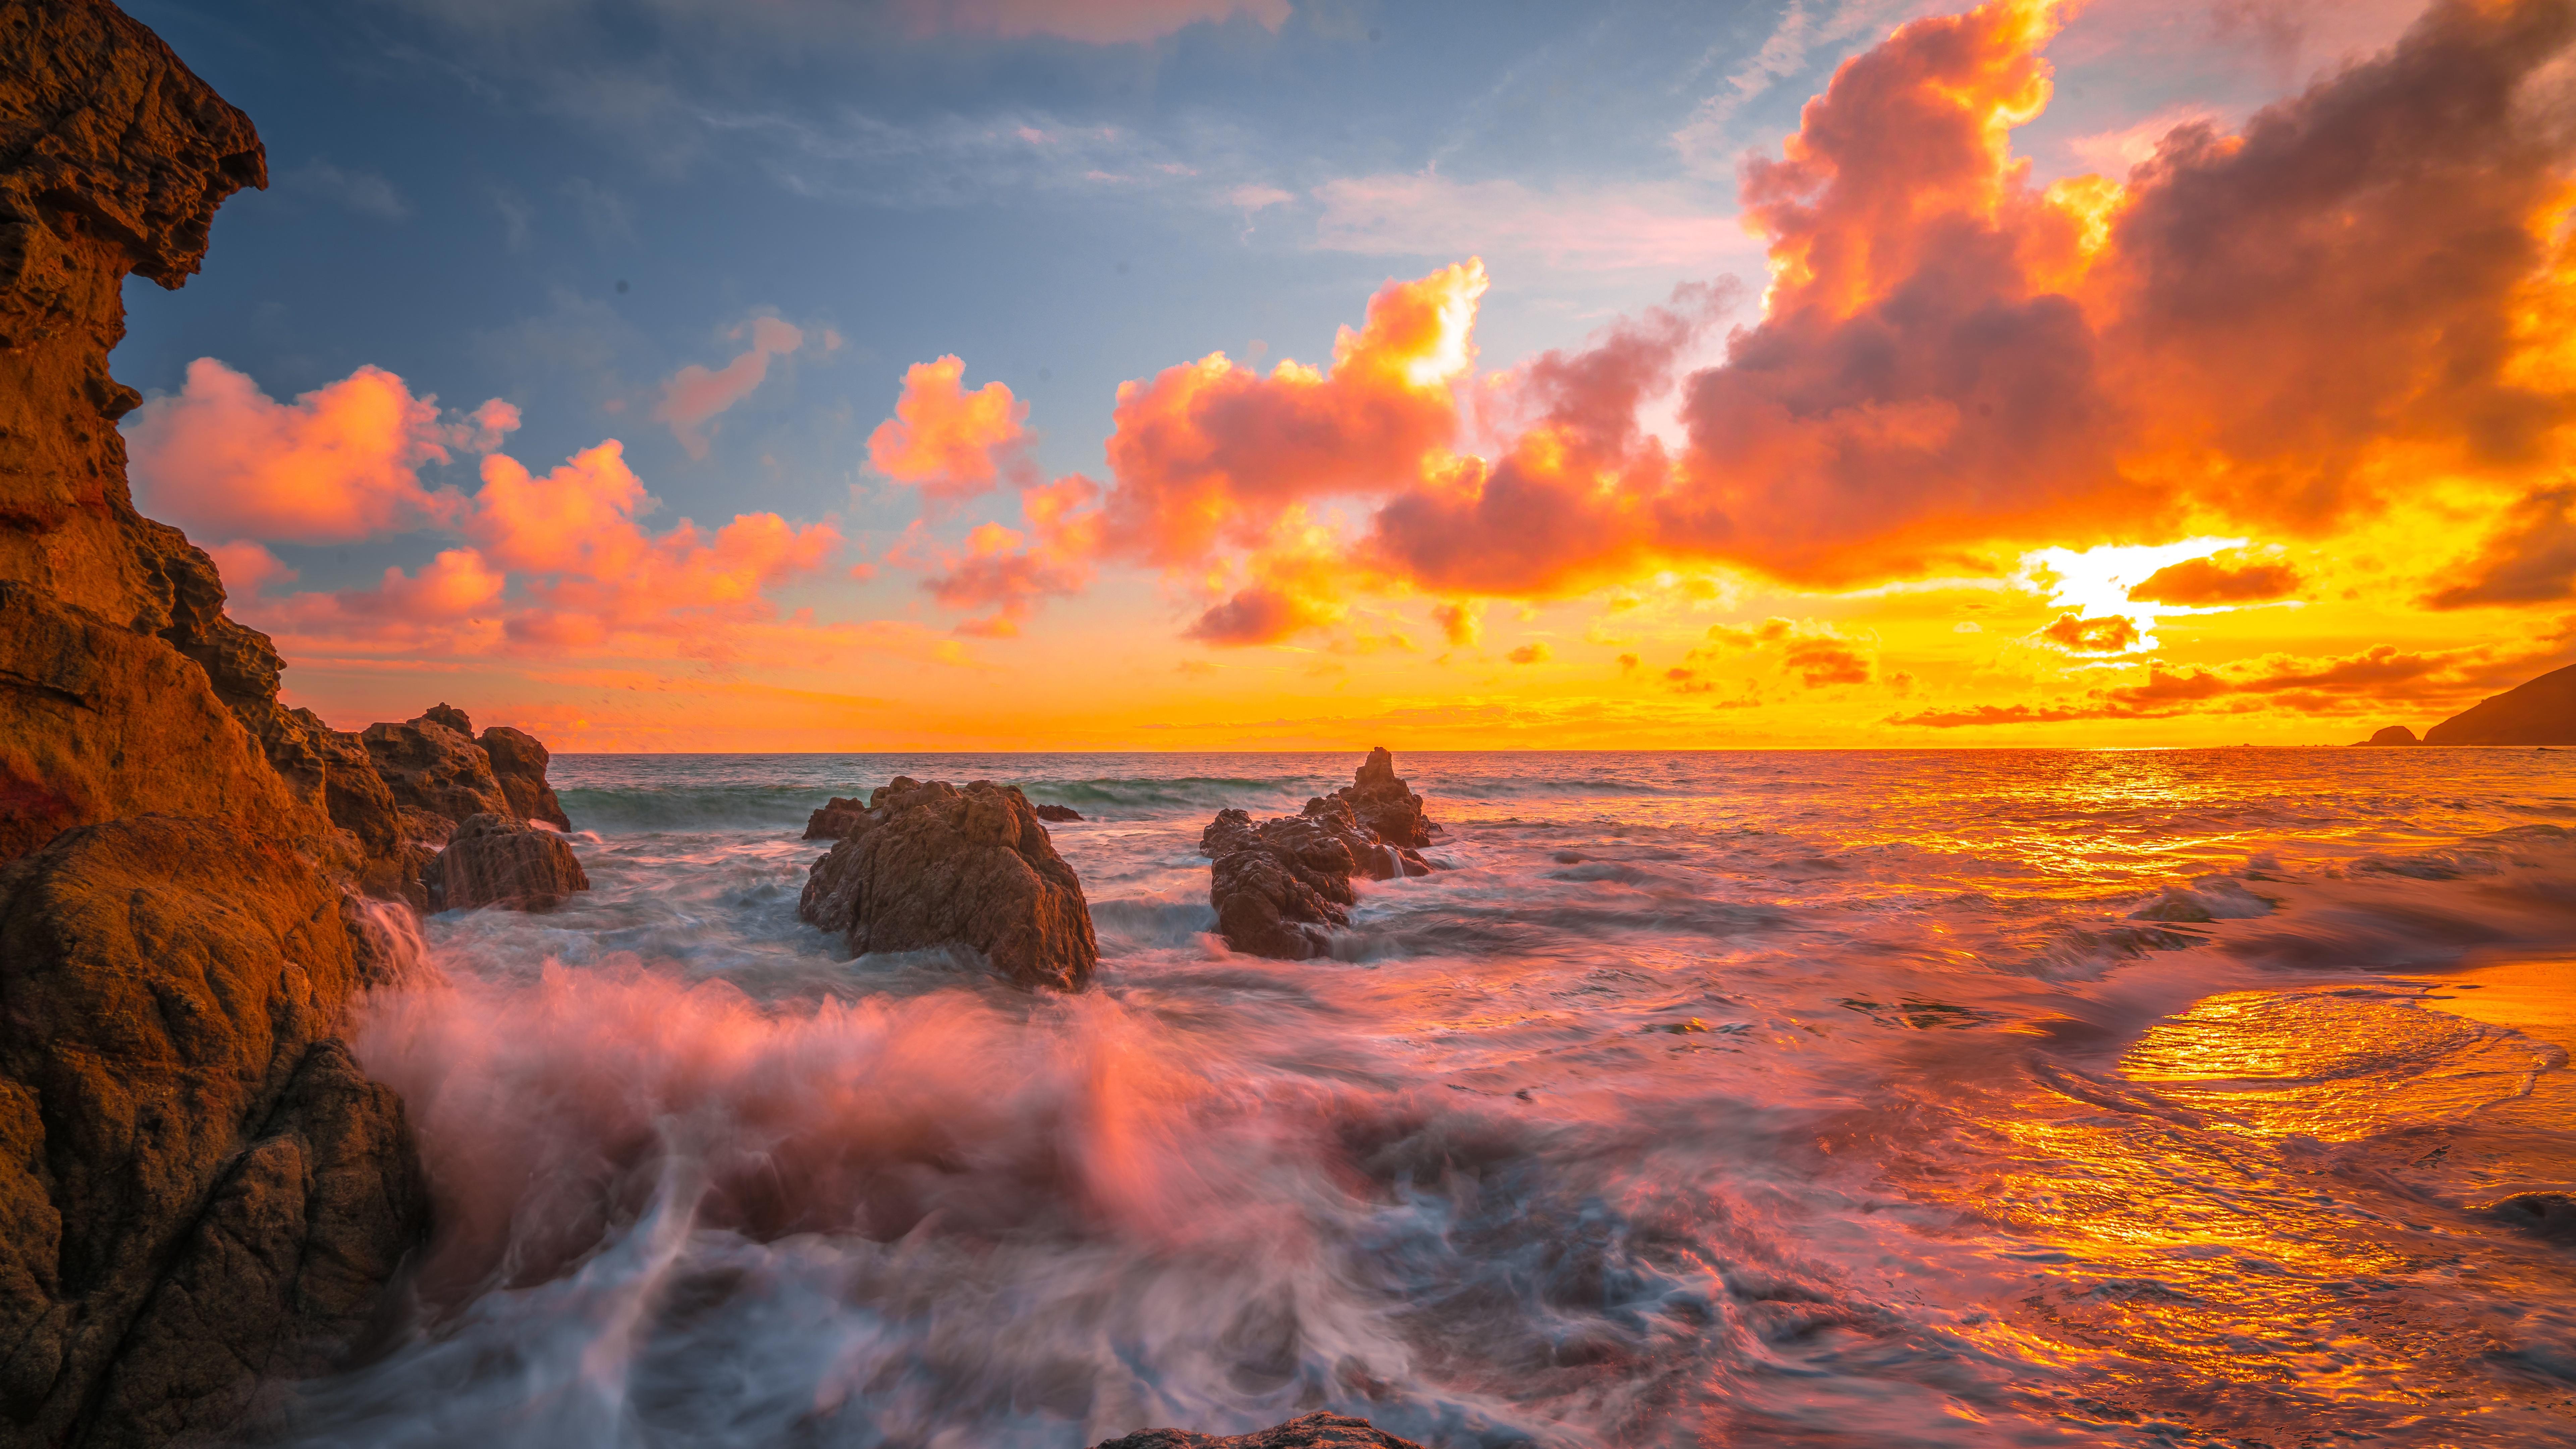 7680x4320 Ocean Sunset 8k 8k HD 4k Wallpapers, Images